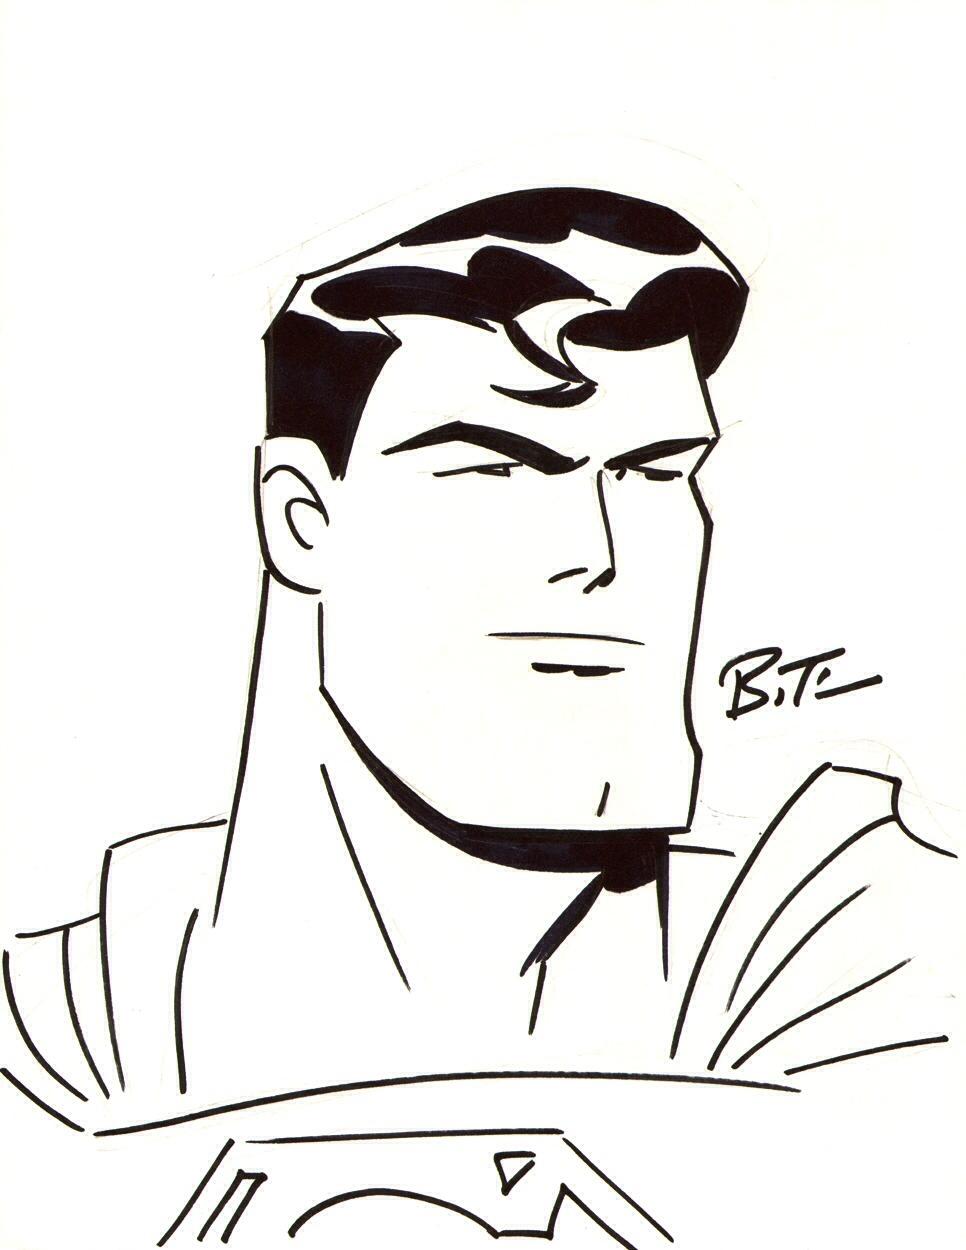 966x1250 Bruce Timm Drawing Bruce Timm, Dc Comics Art And Comic